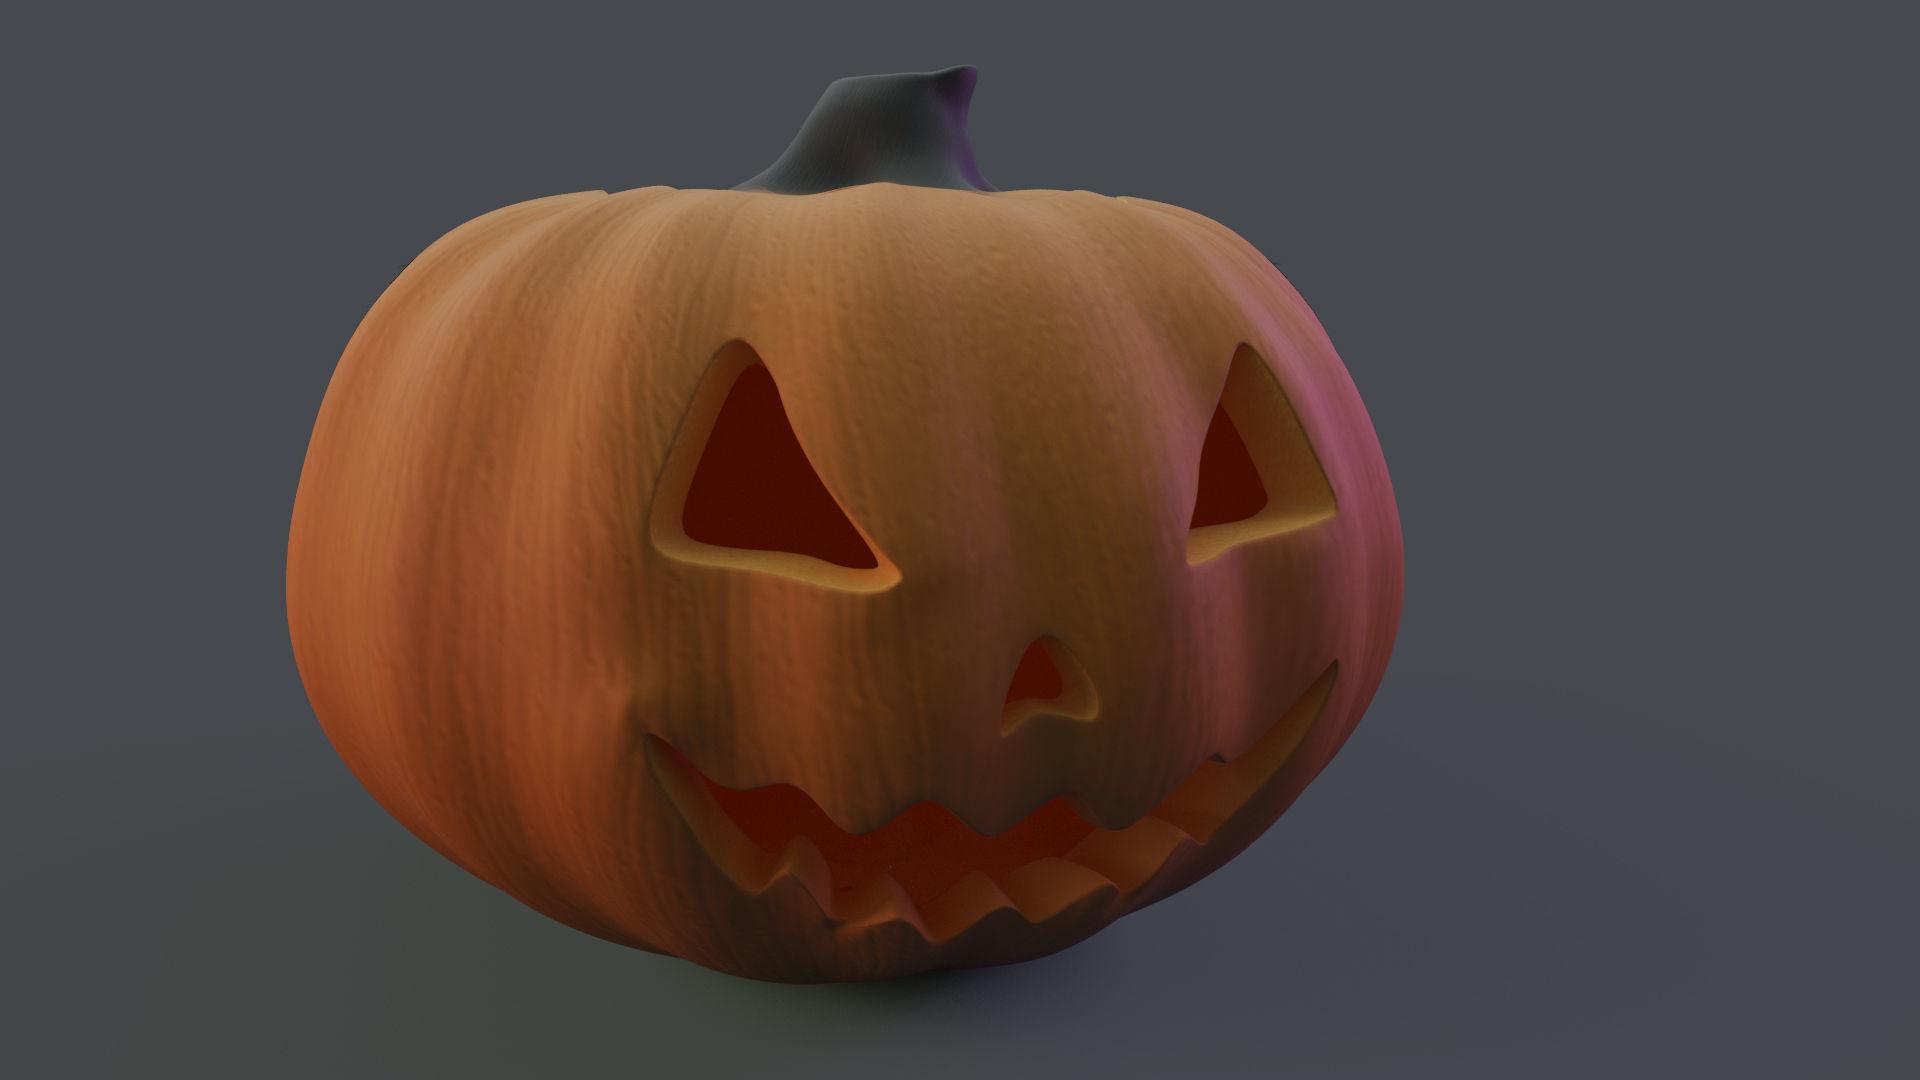 Jack o Lantern - Halloween Pumpkin